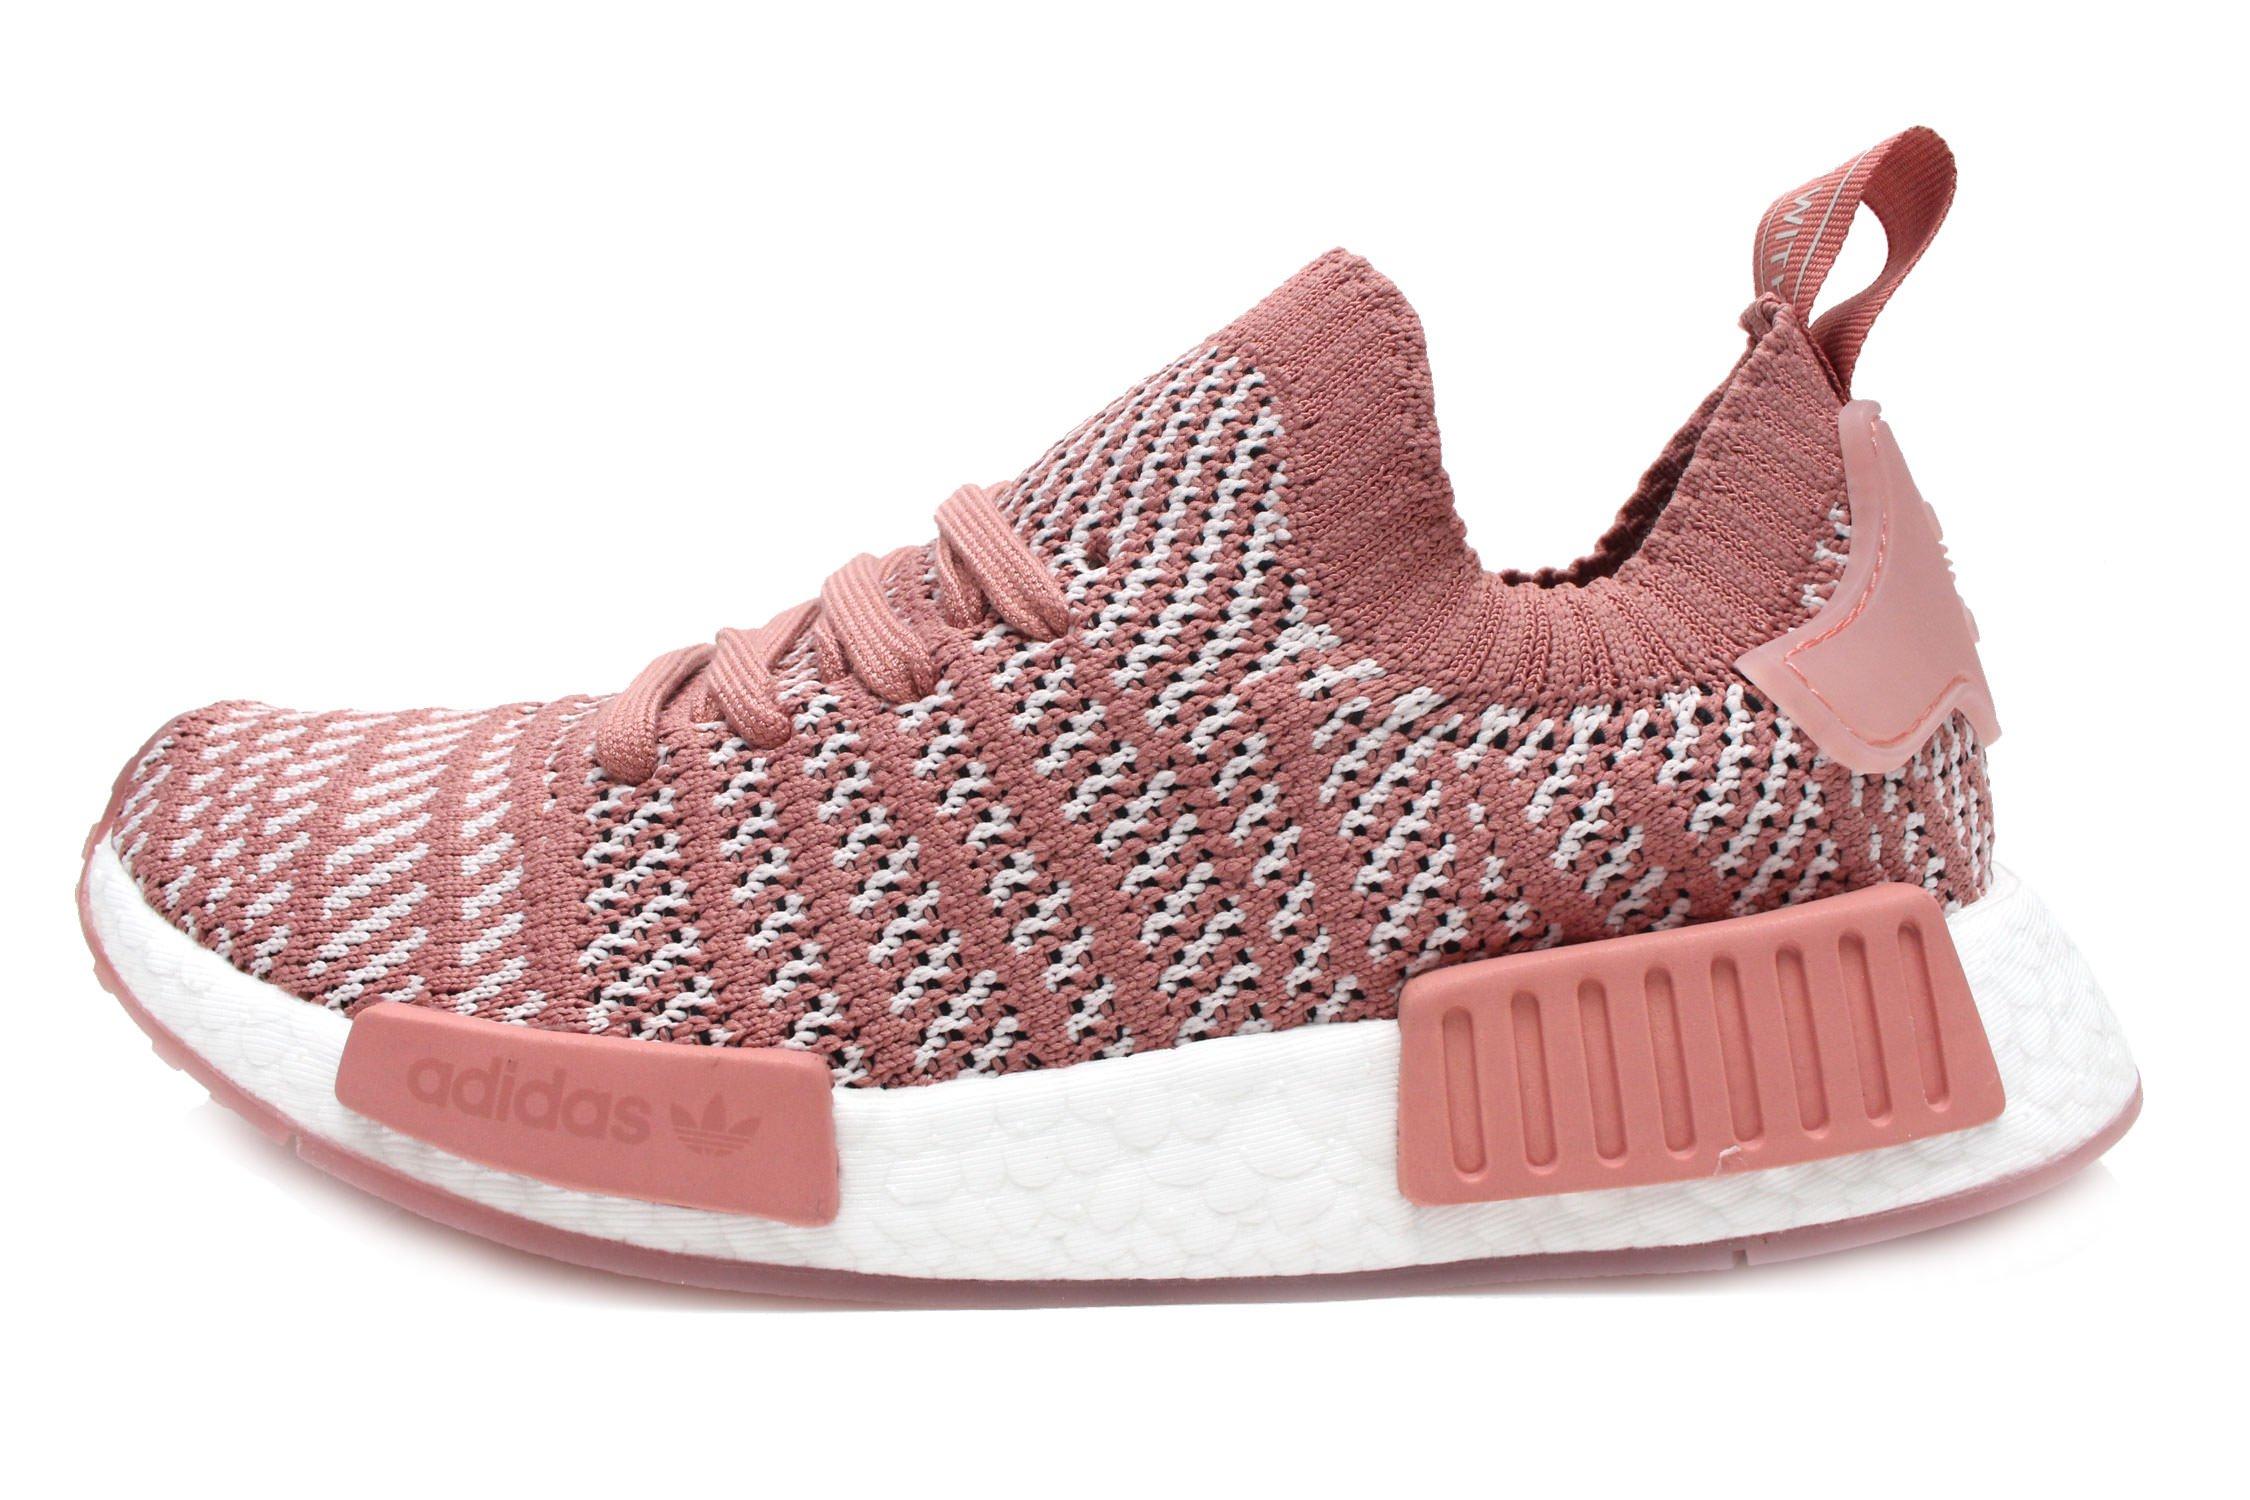 adidas Women's NMD_R1 STLT Primeknit Originals Multi Running Shoe 8 Women US